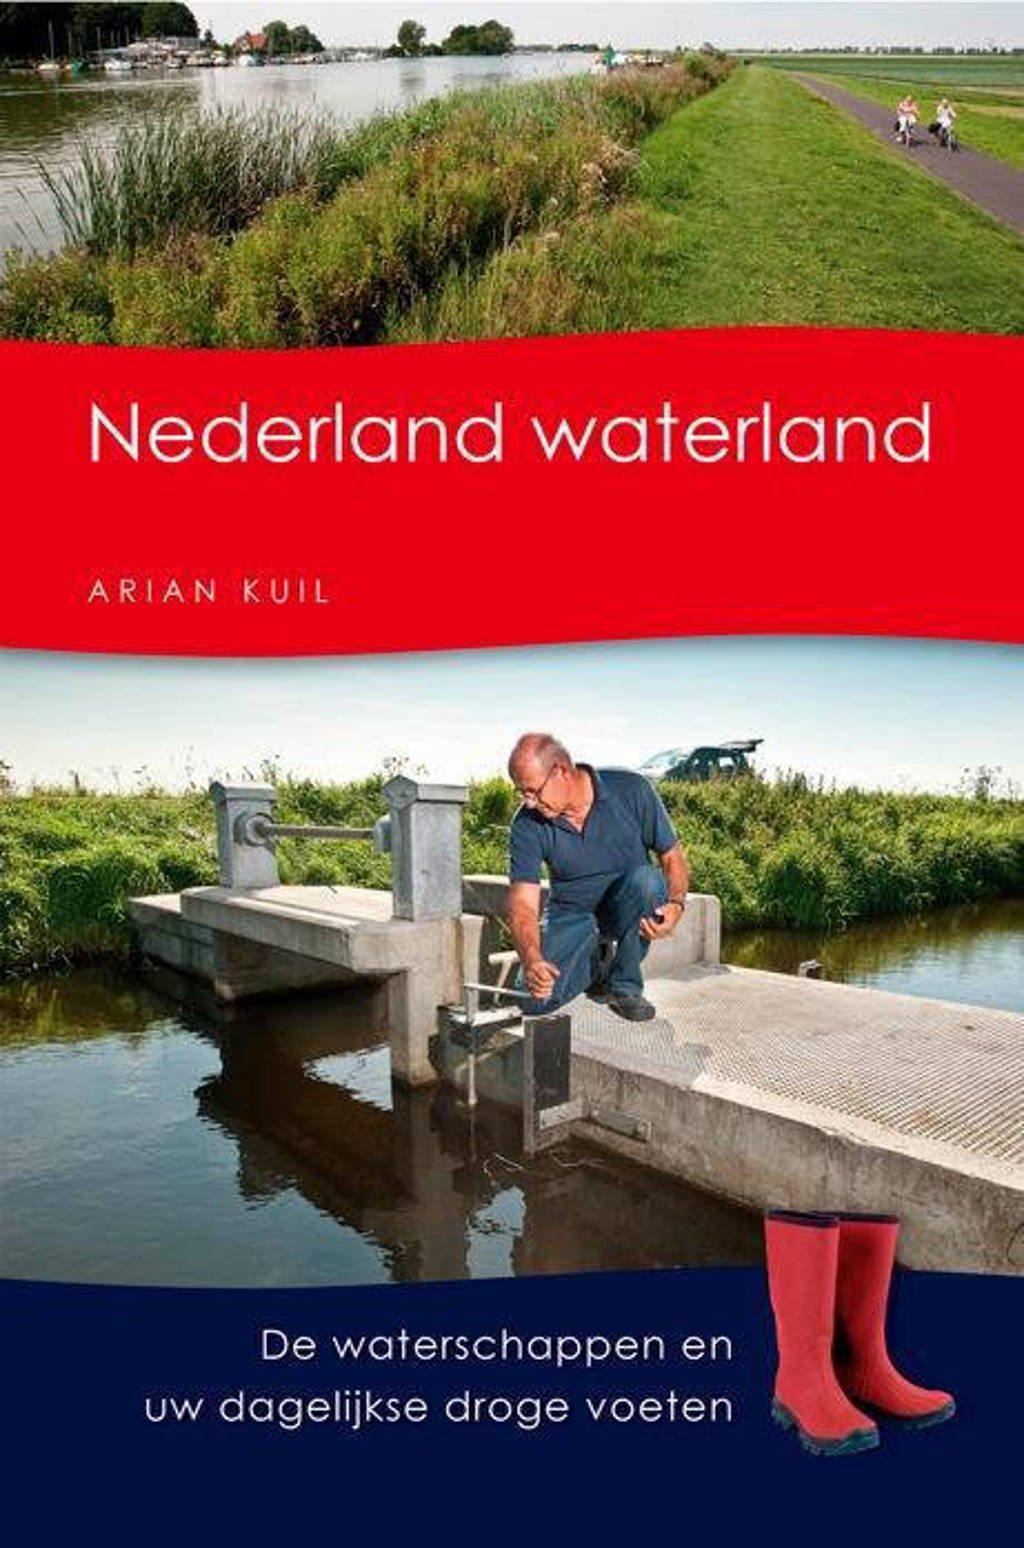 Nederland waterland - Arian Kuil